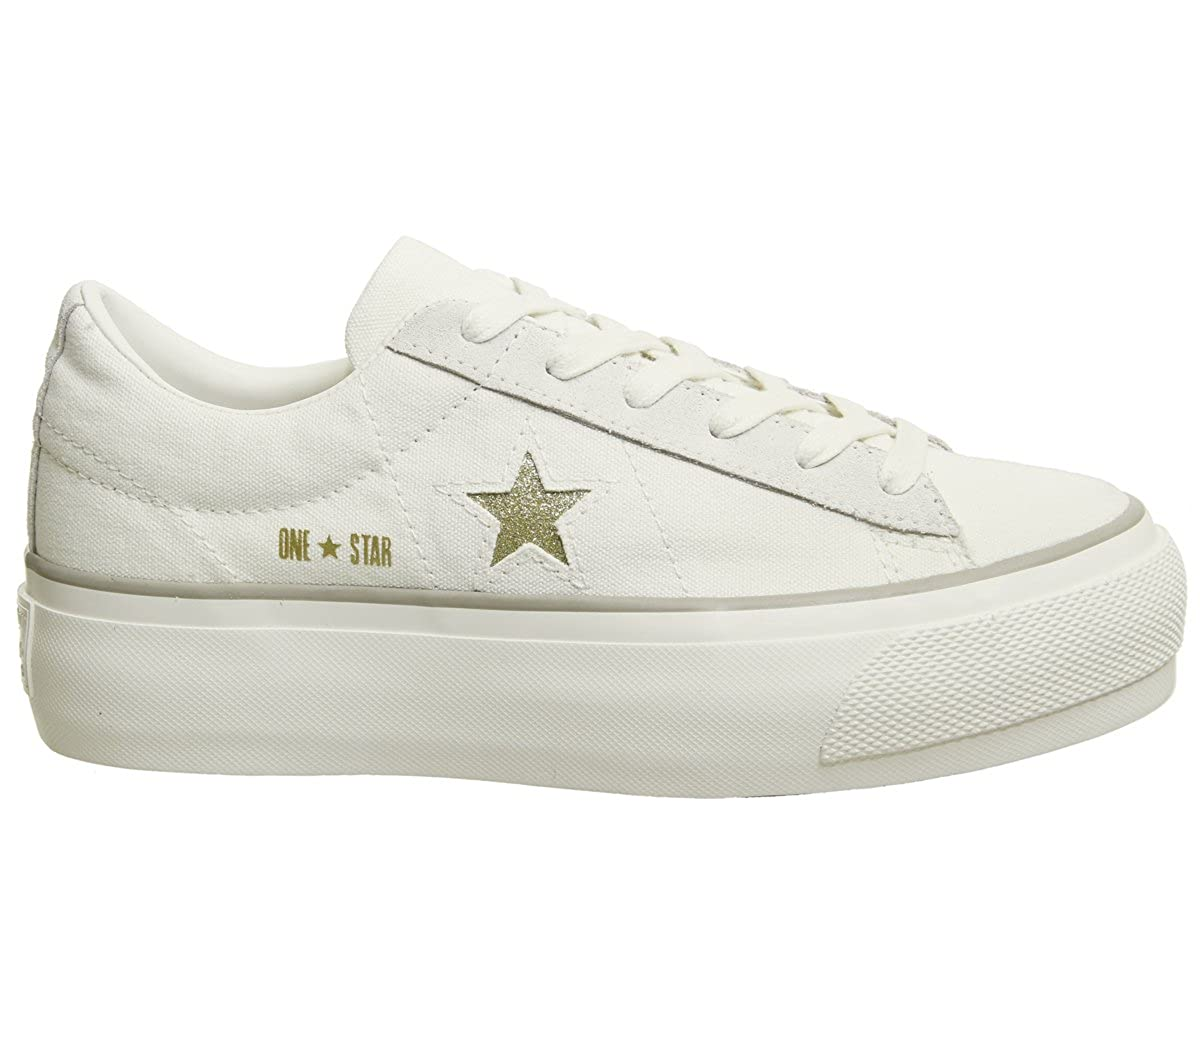 Converse Sneakers One Star Platform Ox Bianco-Oro 560985C Bianco